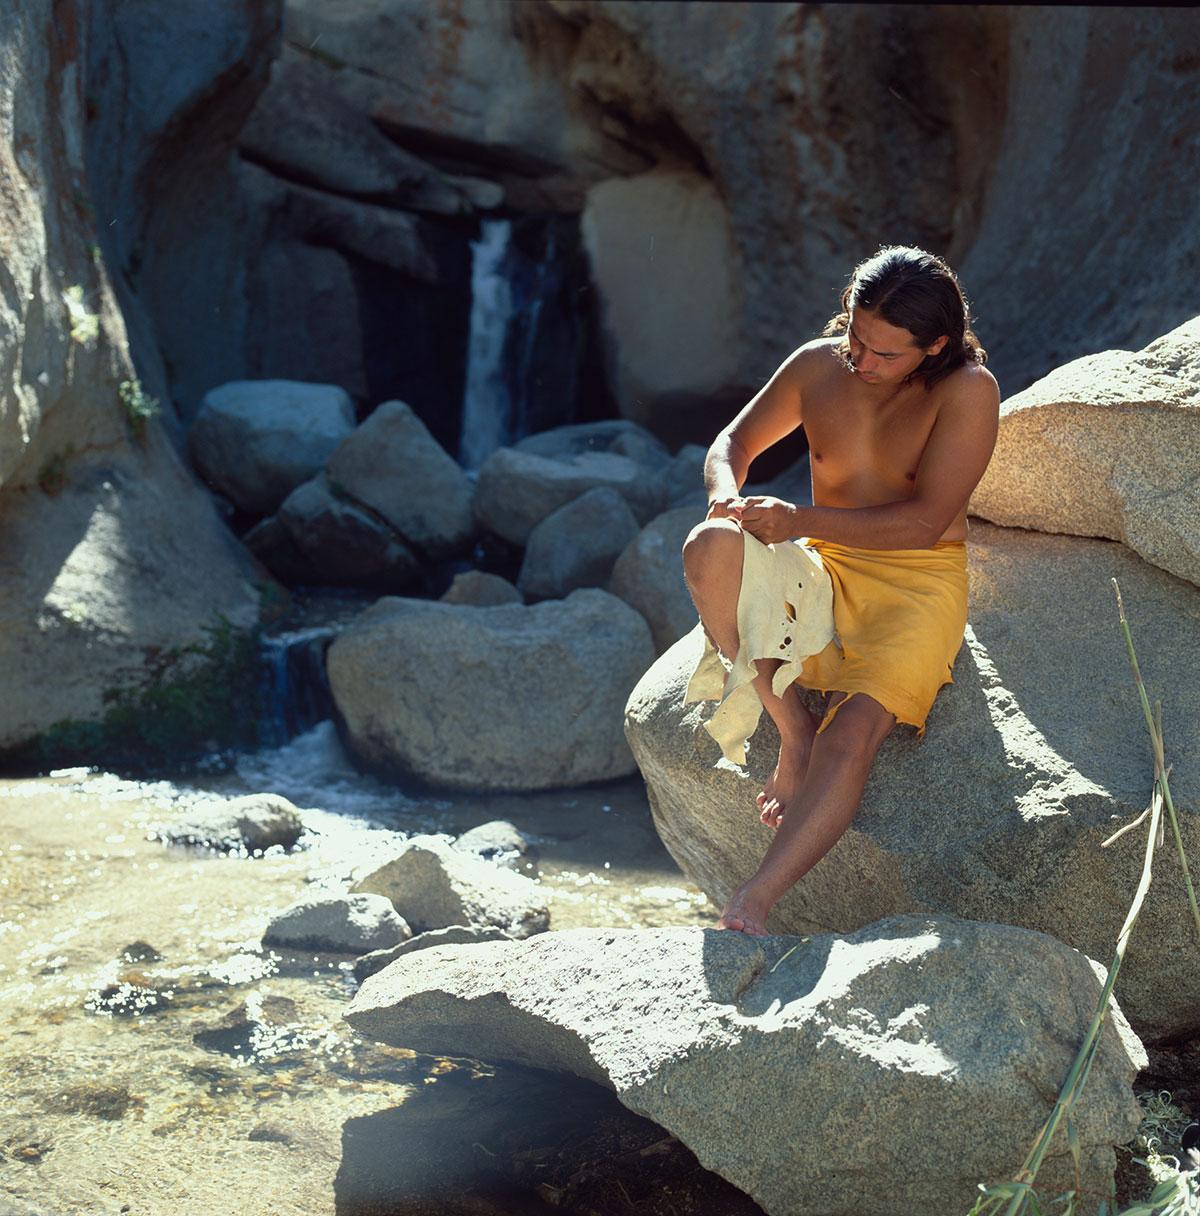 Native Americans - Paiute - Shoshone - Flinting